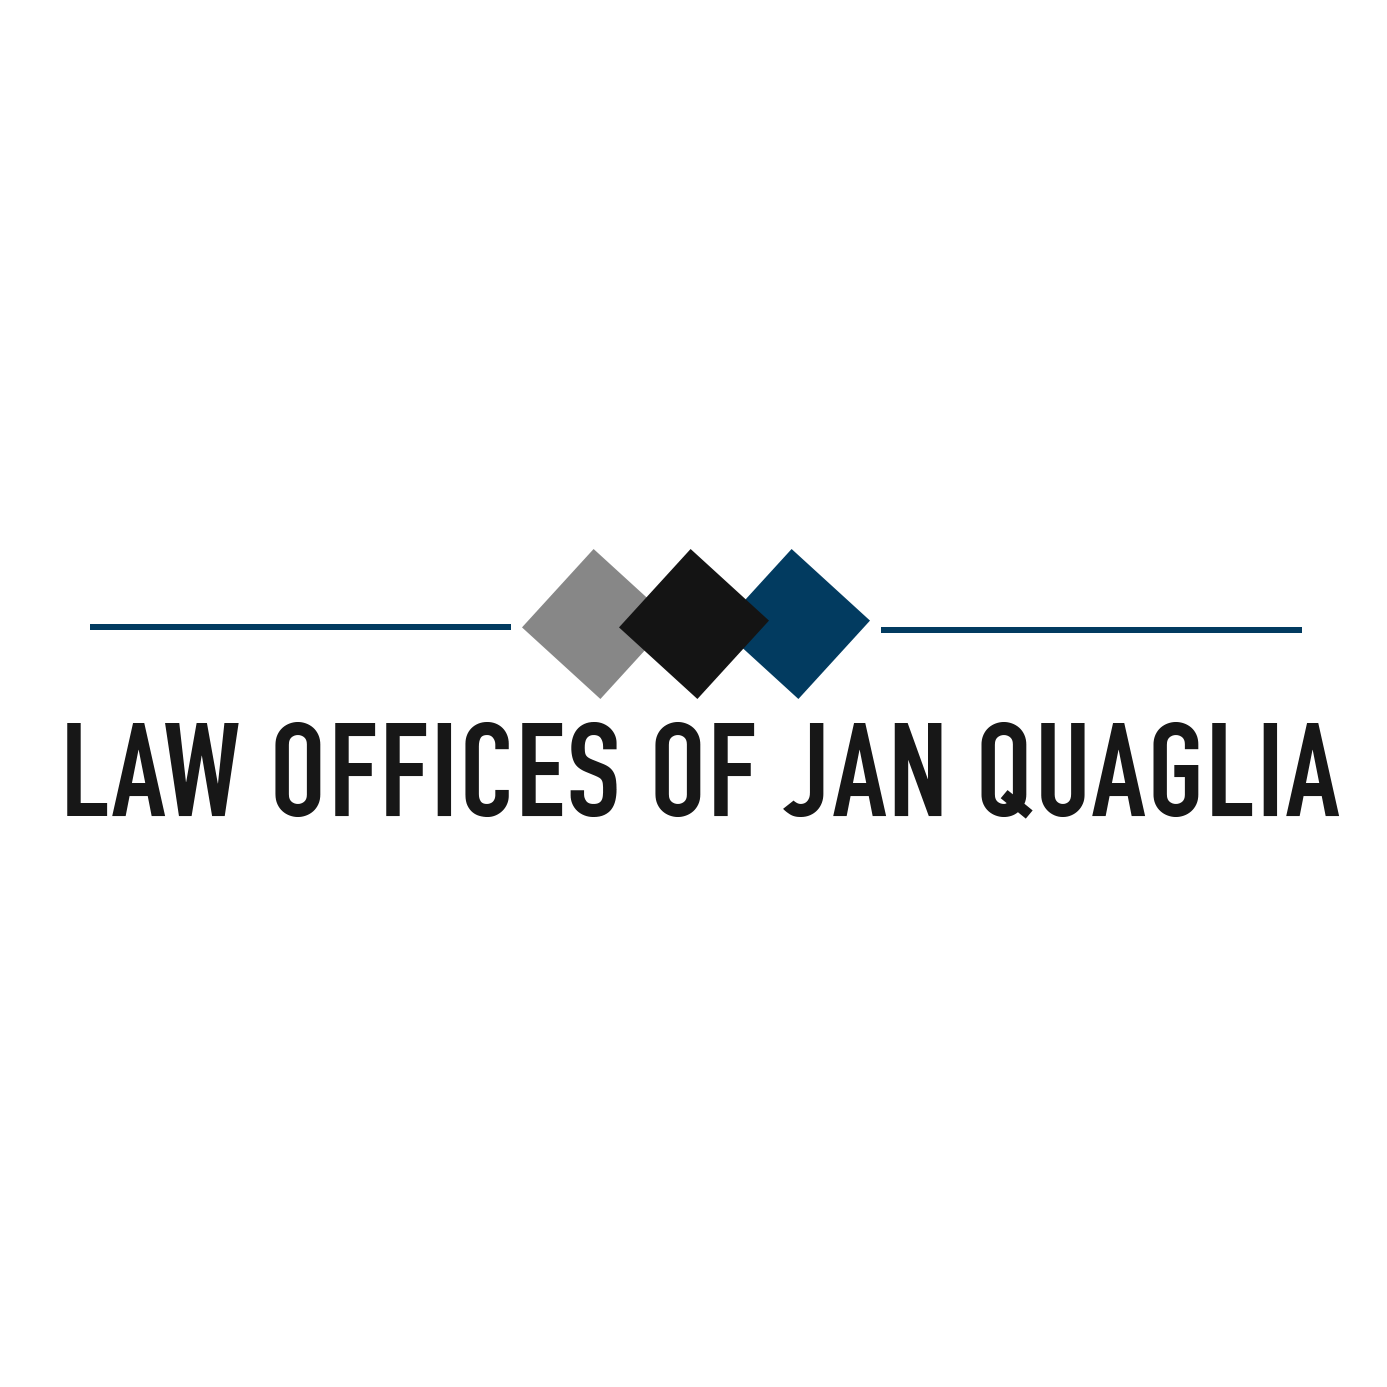 Law Offices of Jan Quaglia